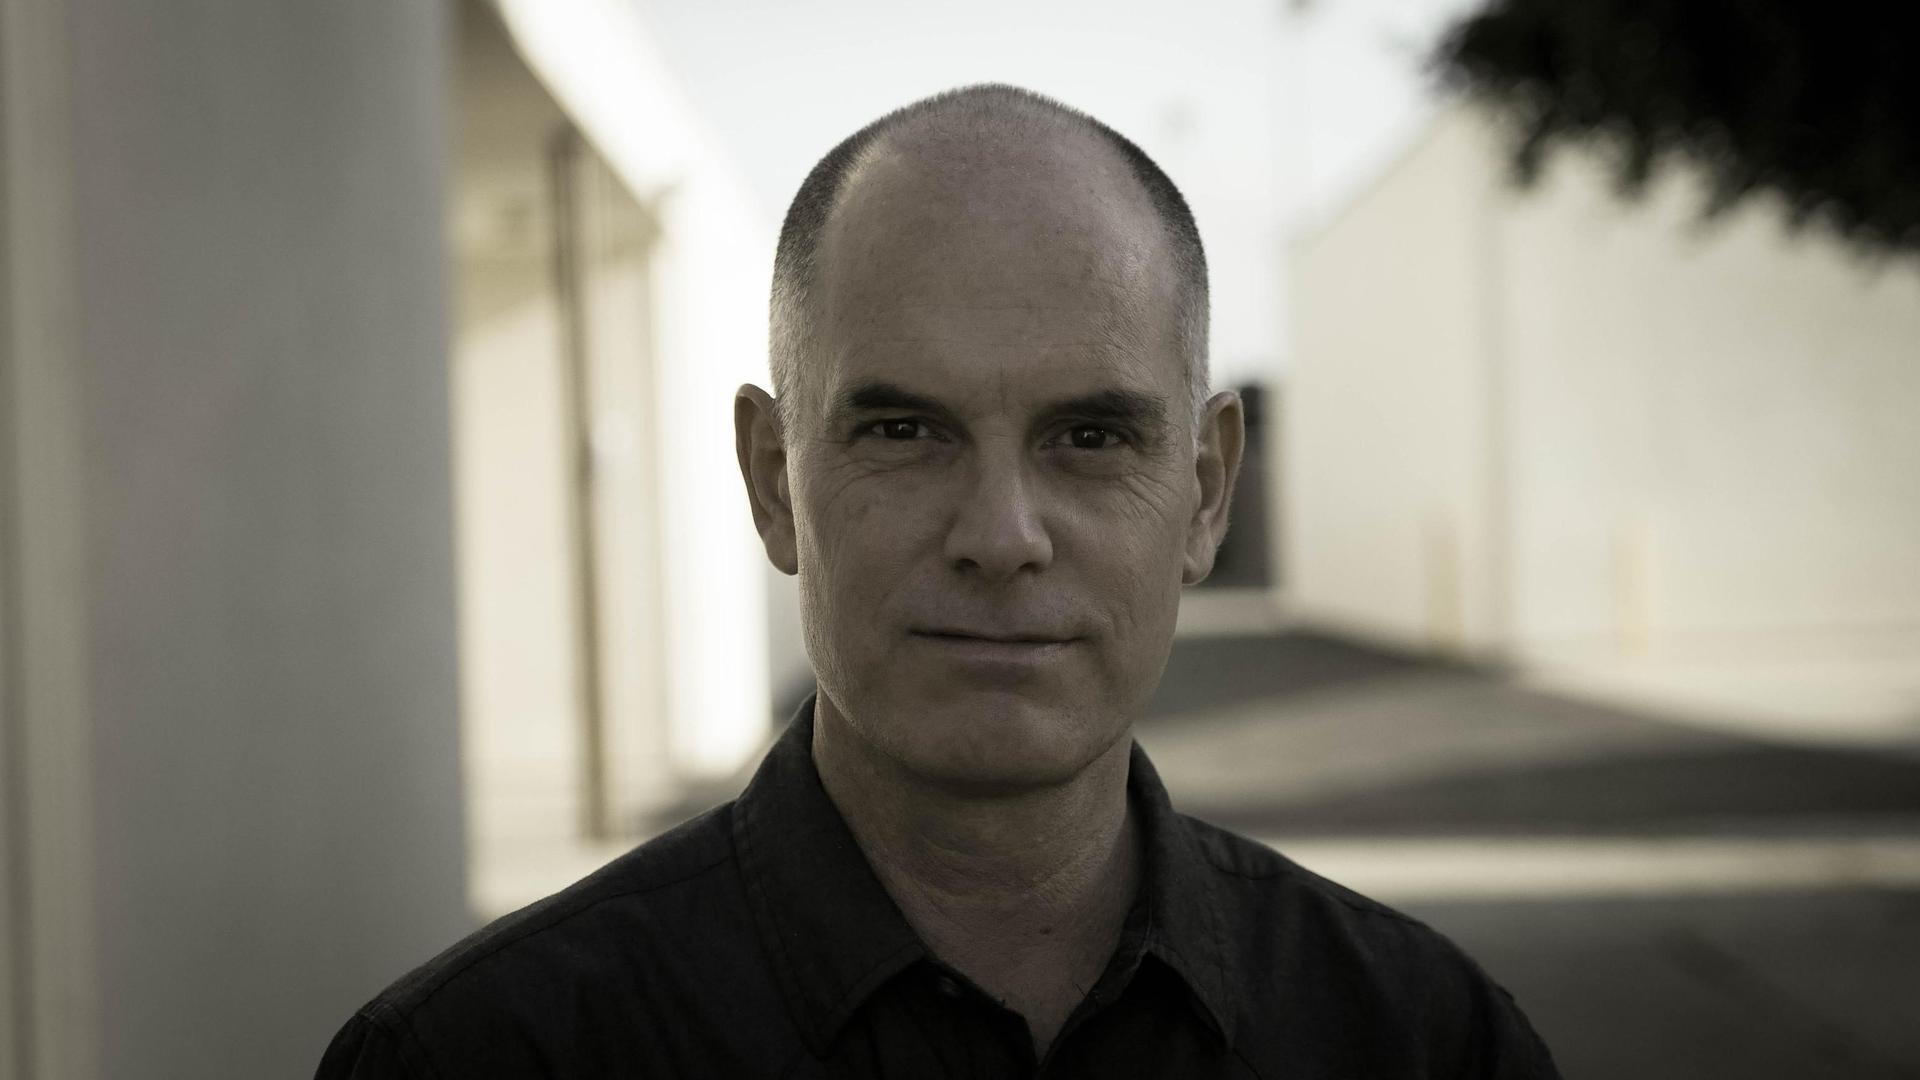 Mark Switzer